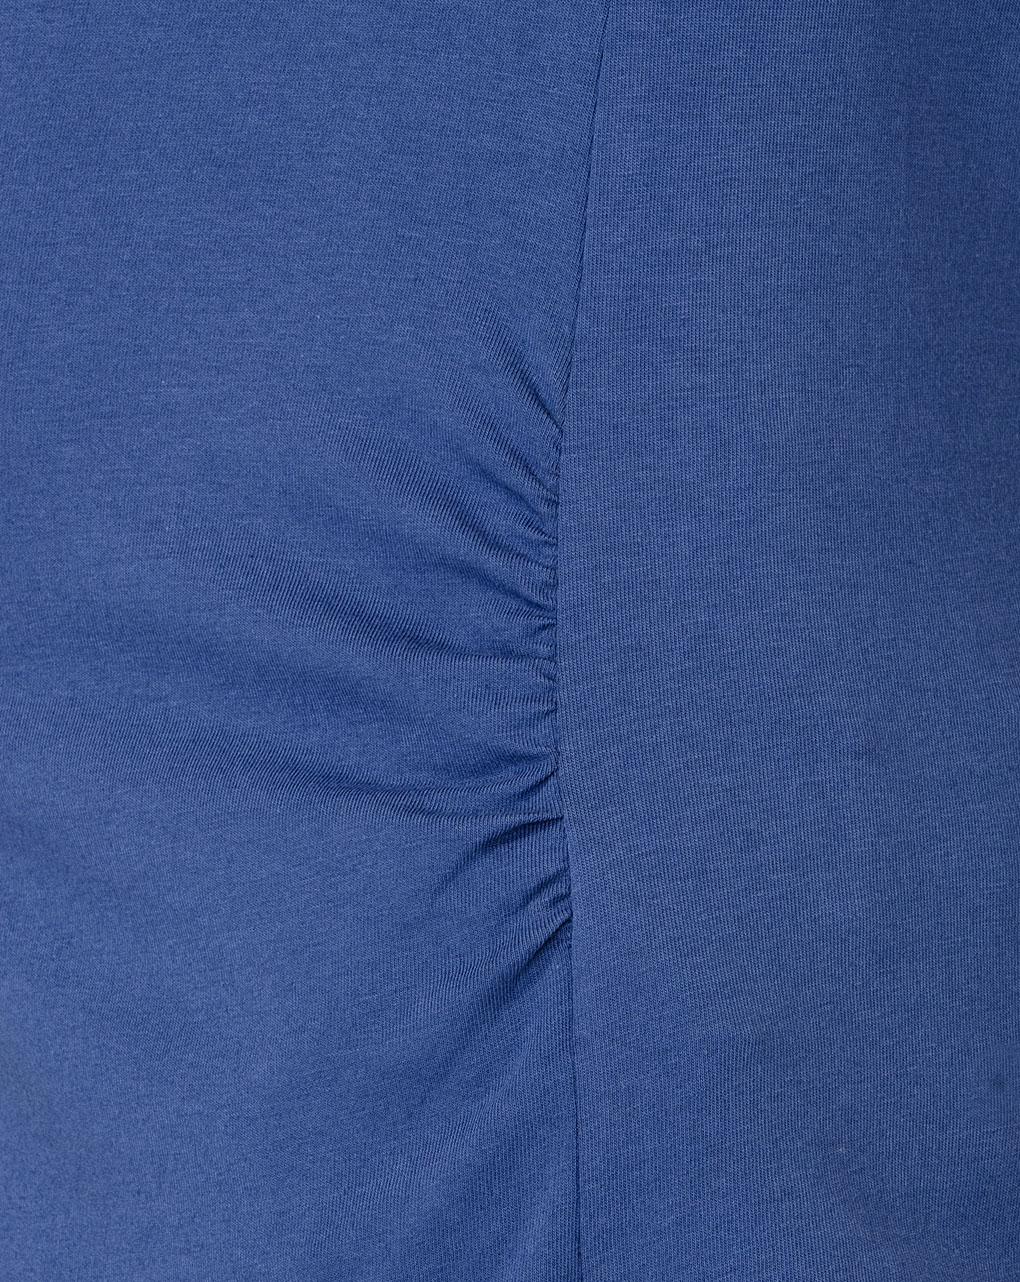 T-shirt allattamento blu - Prénatal